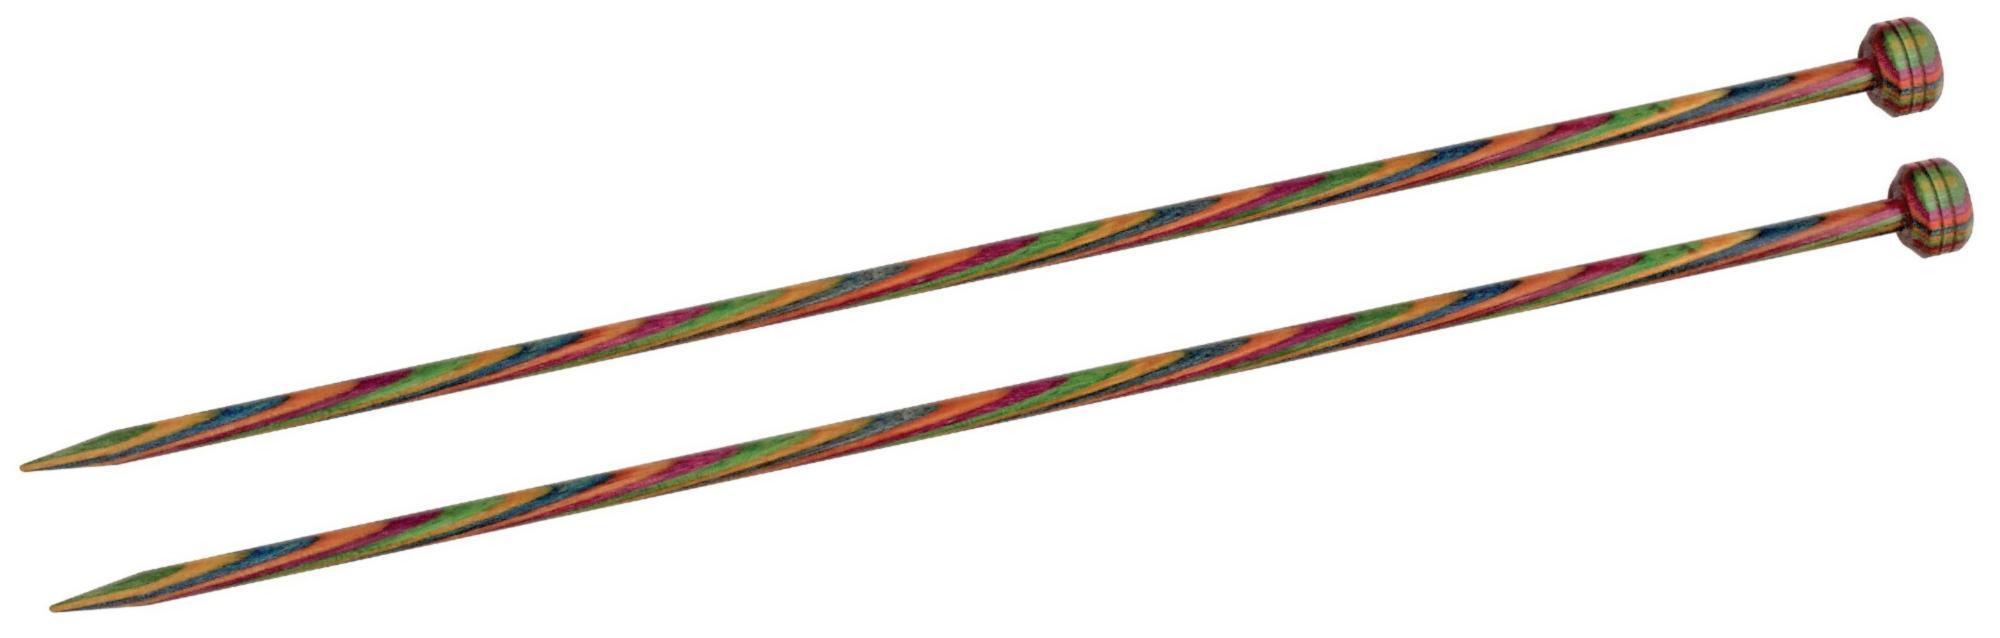 Спицы прямые 35 см Symfonie Wood KnitPro, 20229, 3.00 мм